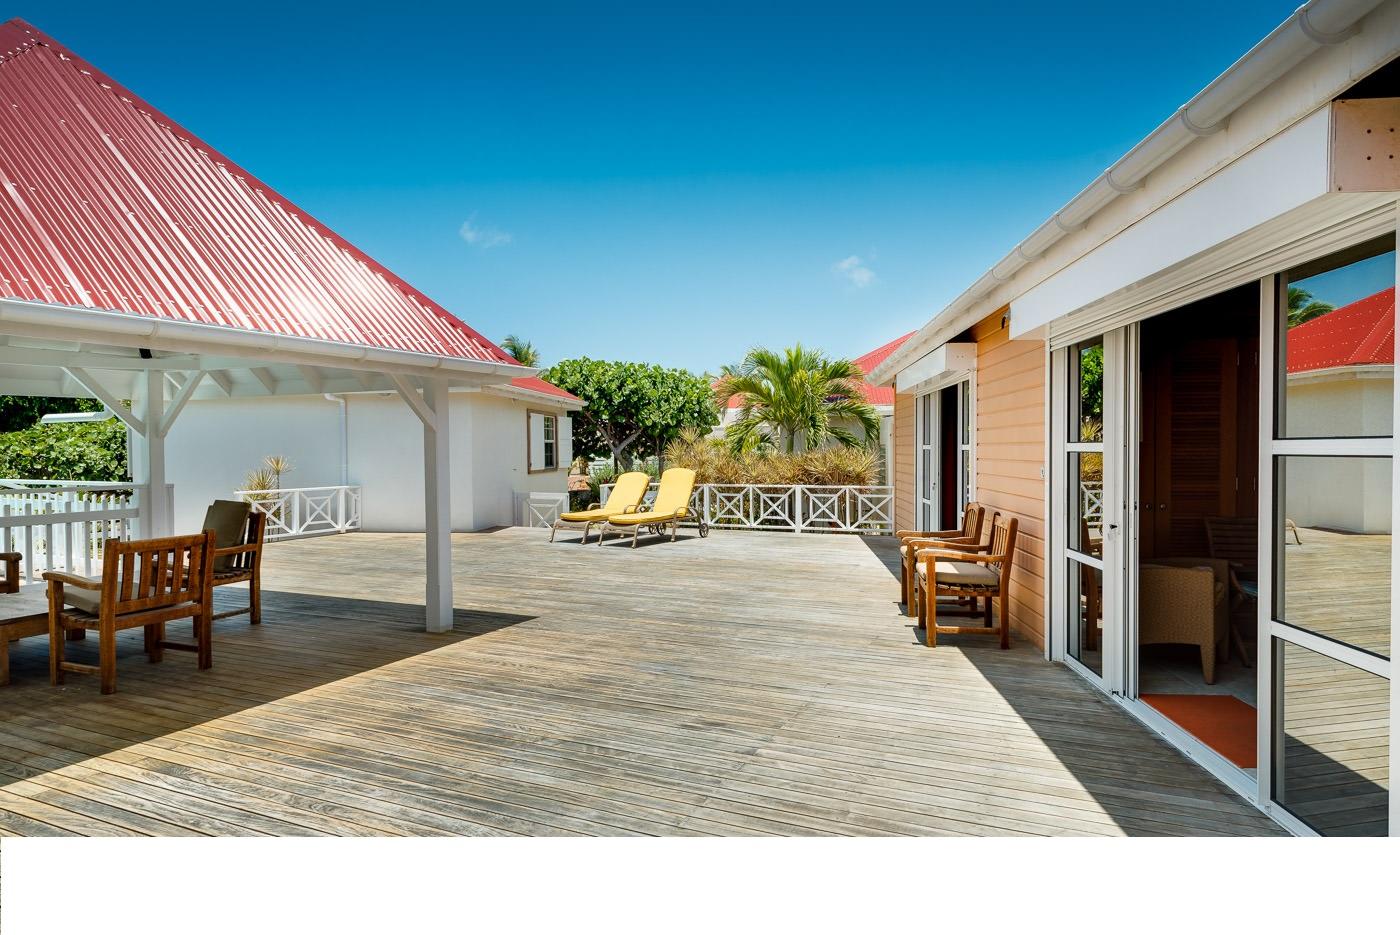 St Barts Bedroom Vacation Als Jean Beach C Reef